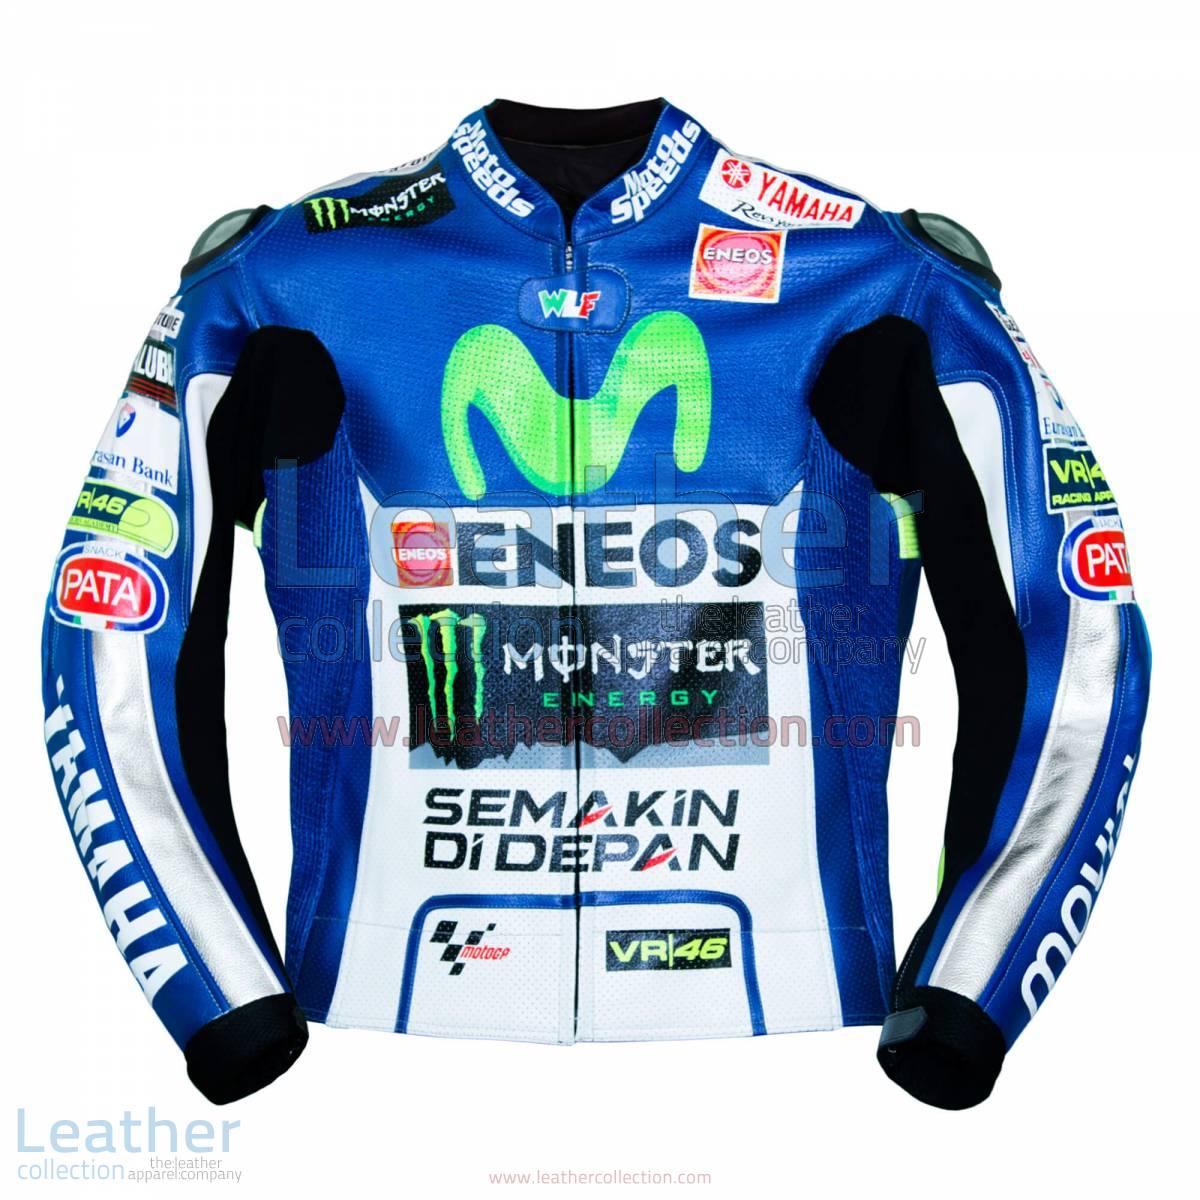 Valentino Rossi Movistar Yamaha 2015 MotoGP Leather Jacket | Valentino Rossi Movistar Yamaha 2015 MotoGP Leather Jacket